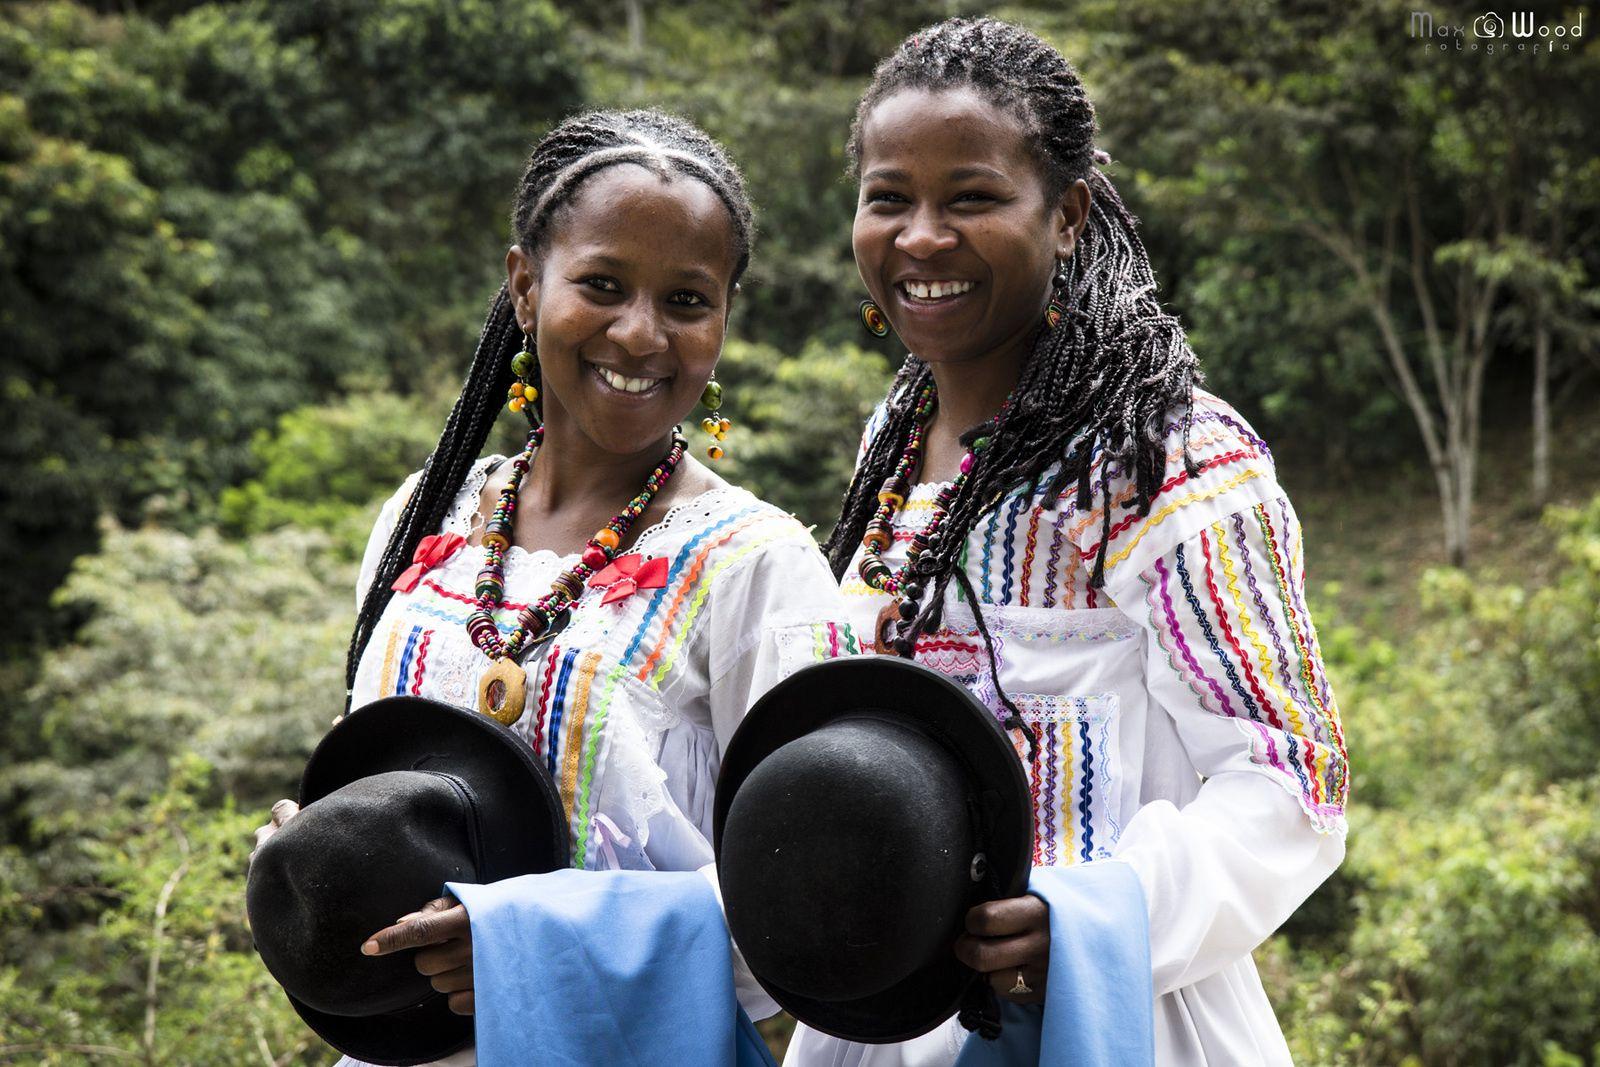 SAYA, AFRO-BOLIVIAN CULTURE - Chijchipa - Yungas region - Bolivia